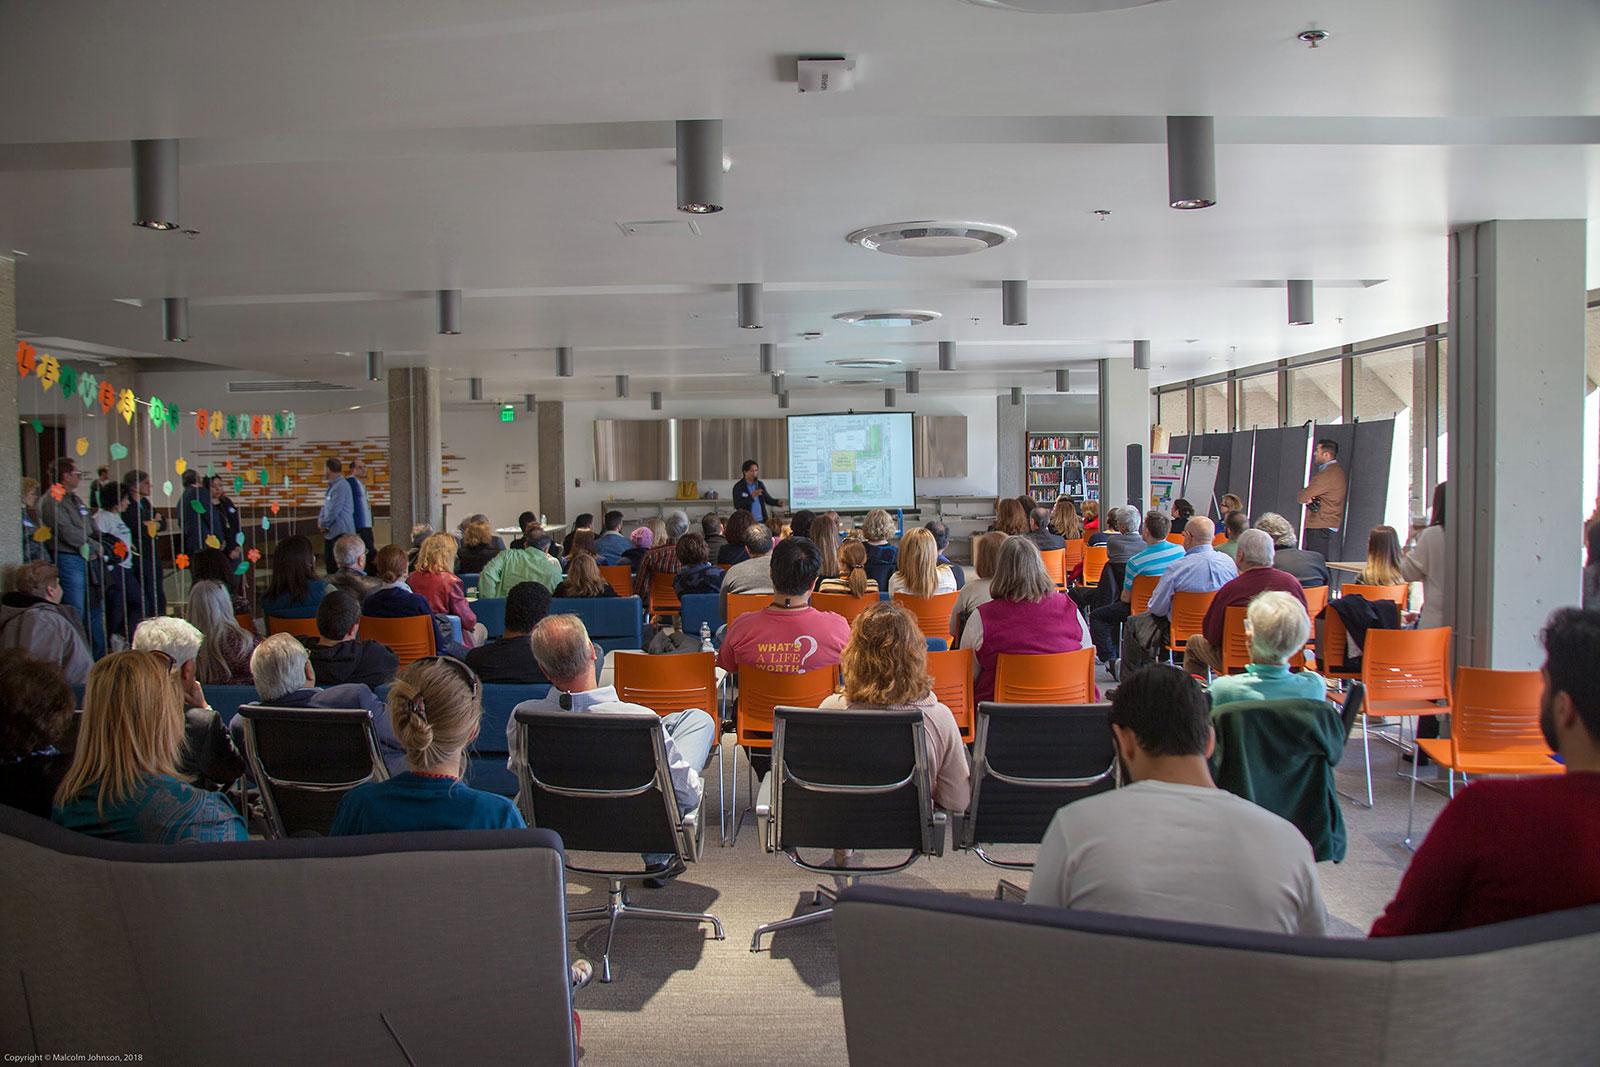 Glendale Central Park Community Meeting Jan 20